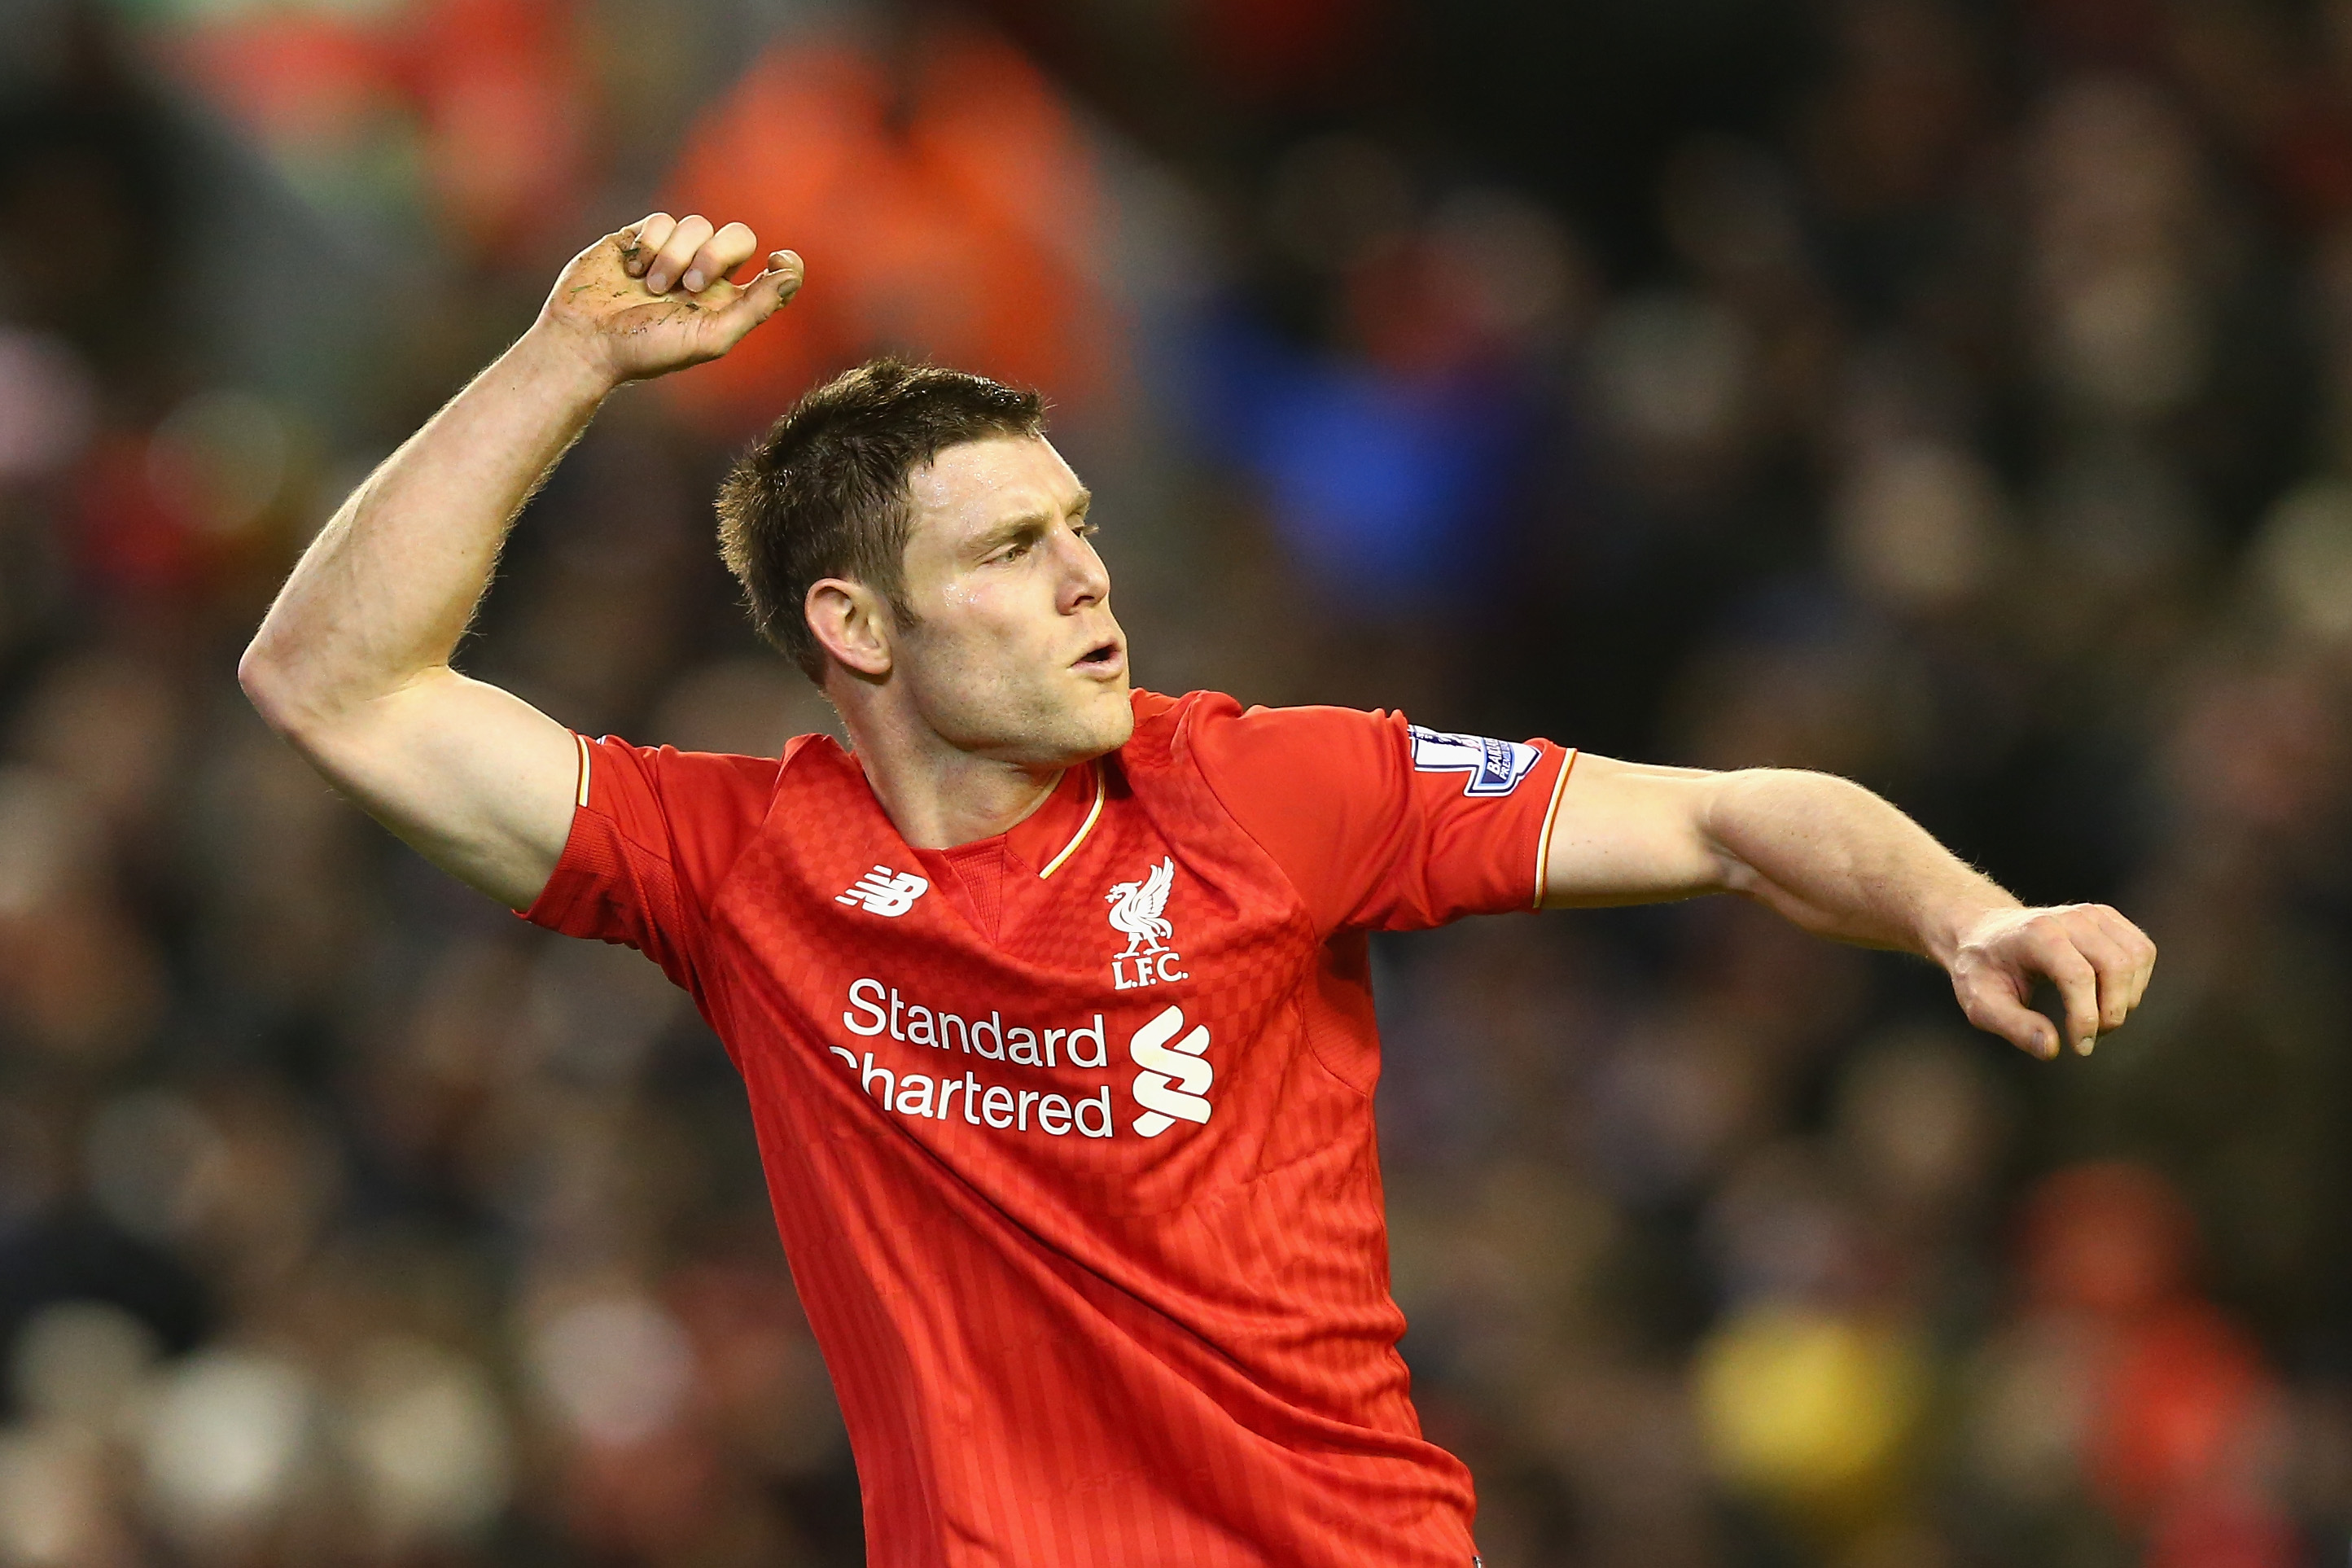 James Milner is better than Cesc Fabregas, Paul Pogba & Gareth Bale, according to Uefa rankings